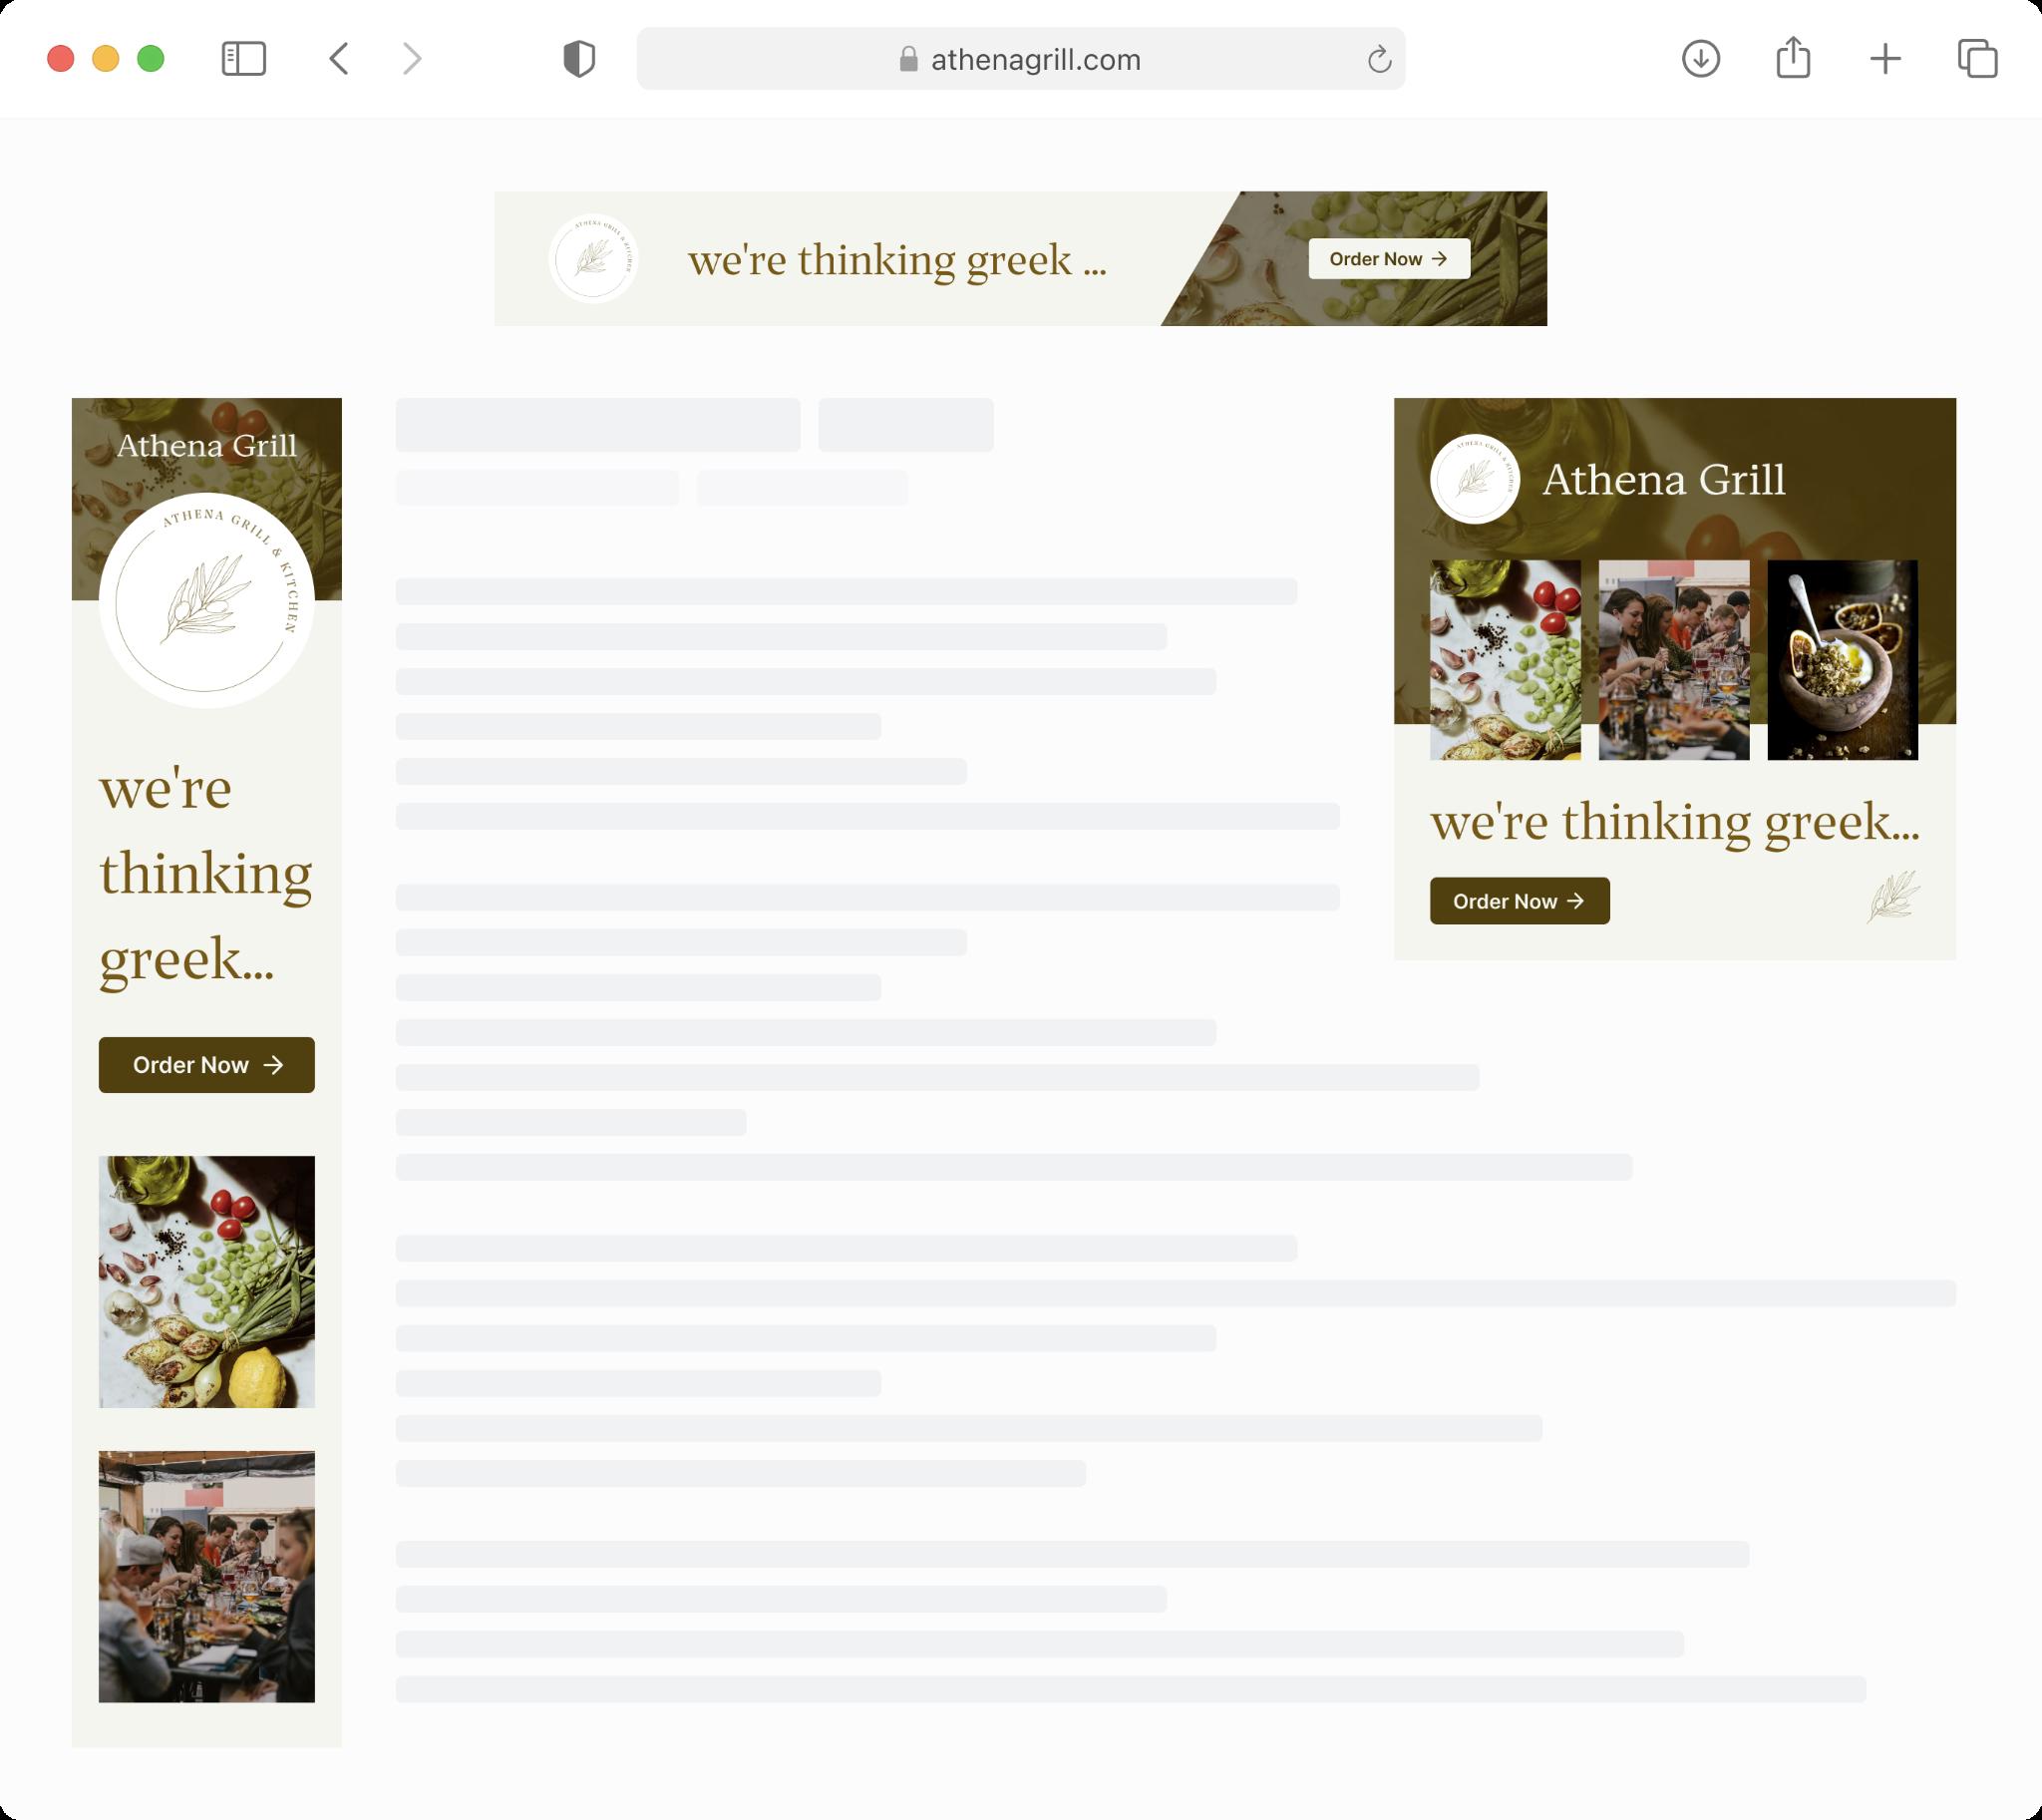 Restaurant Customer Acquisition - Remarketing Ads